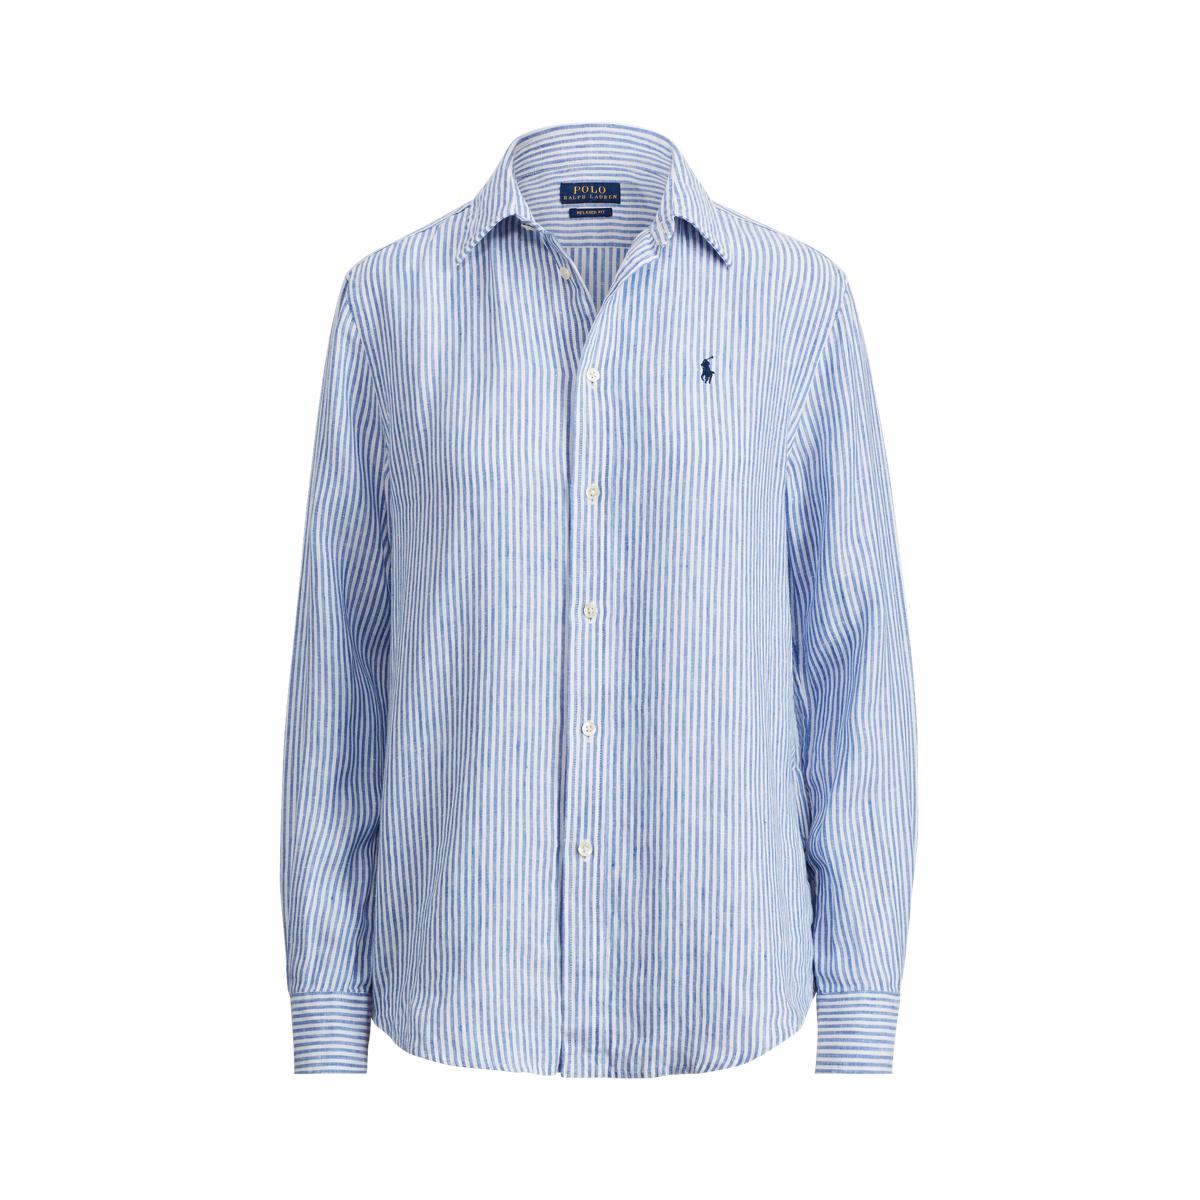 84fe9b9f2f41 Relaxed Striped Linen Shirt